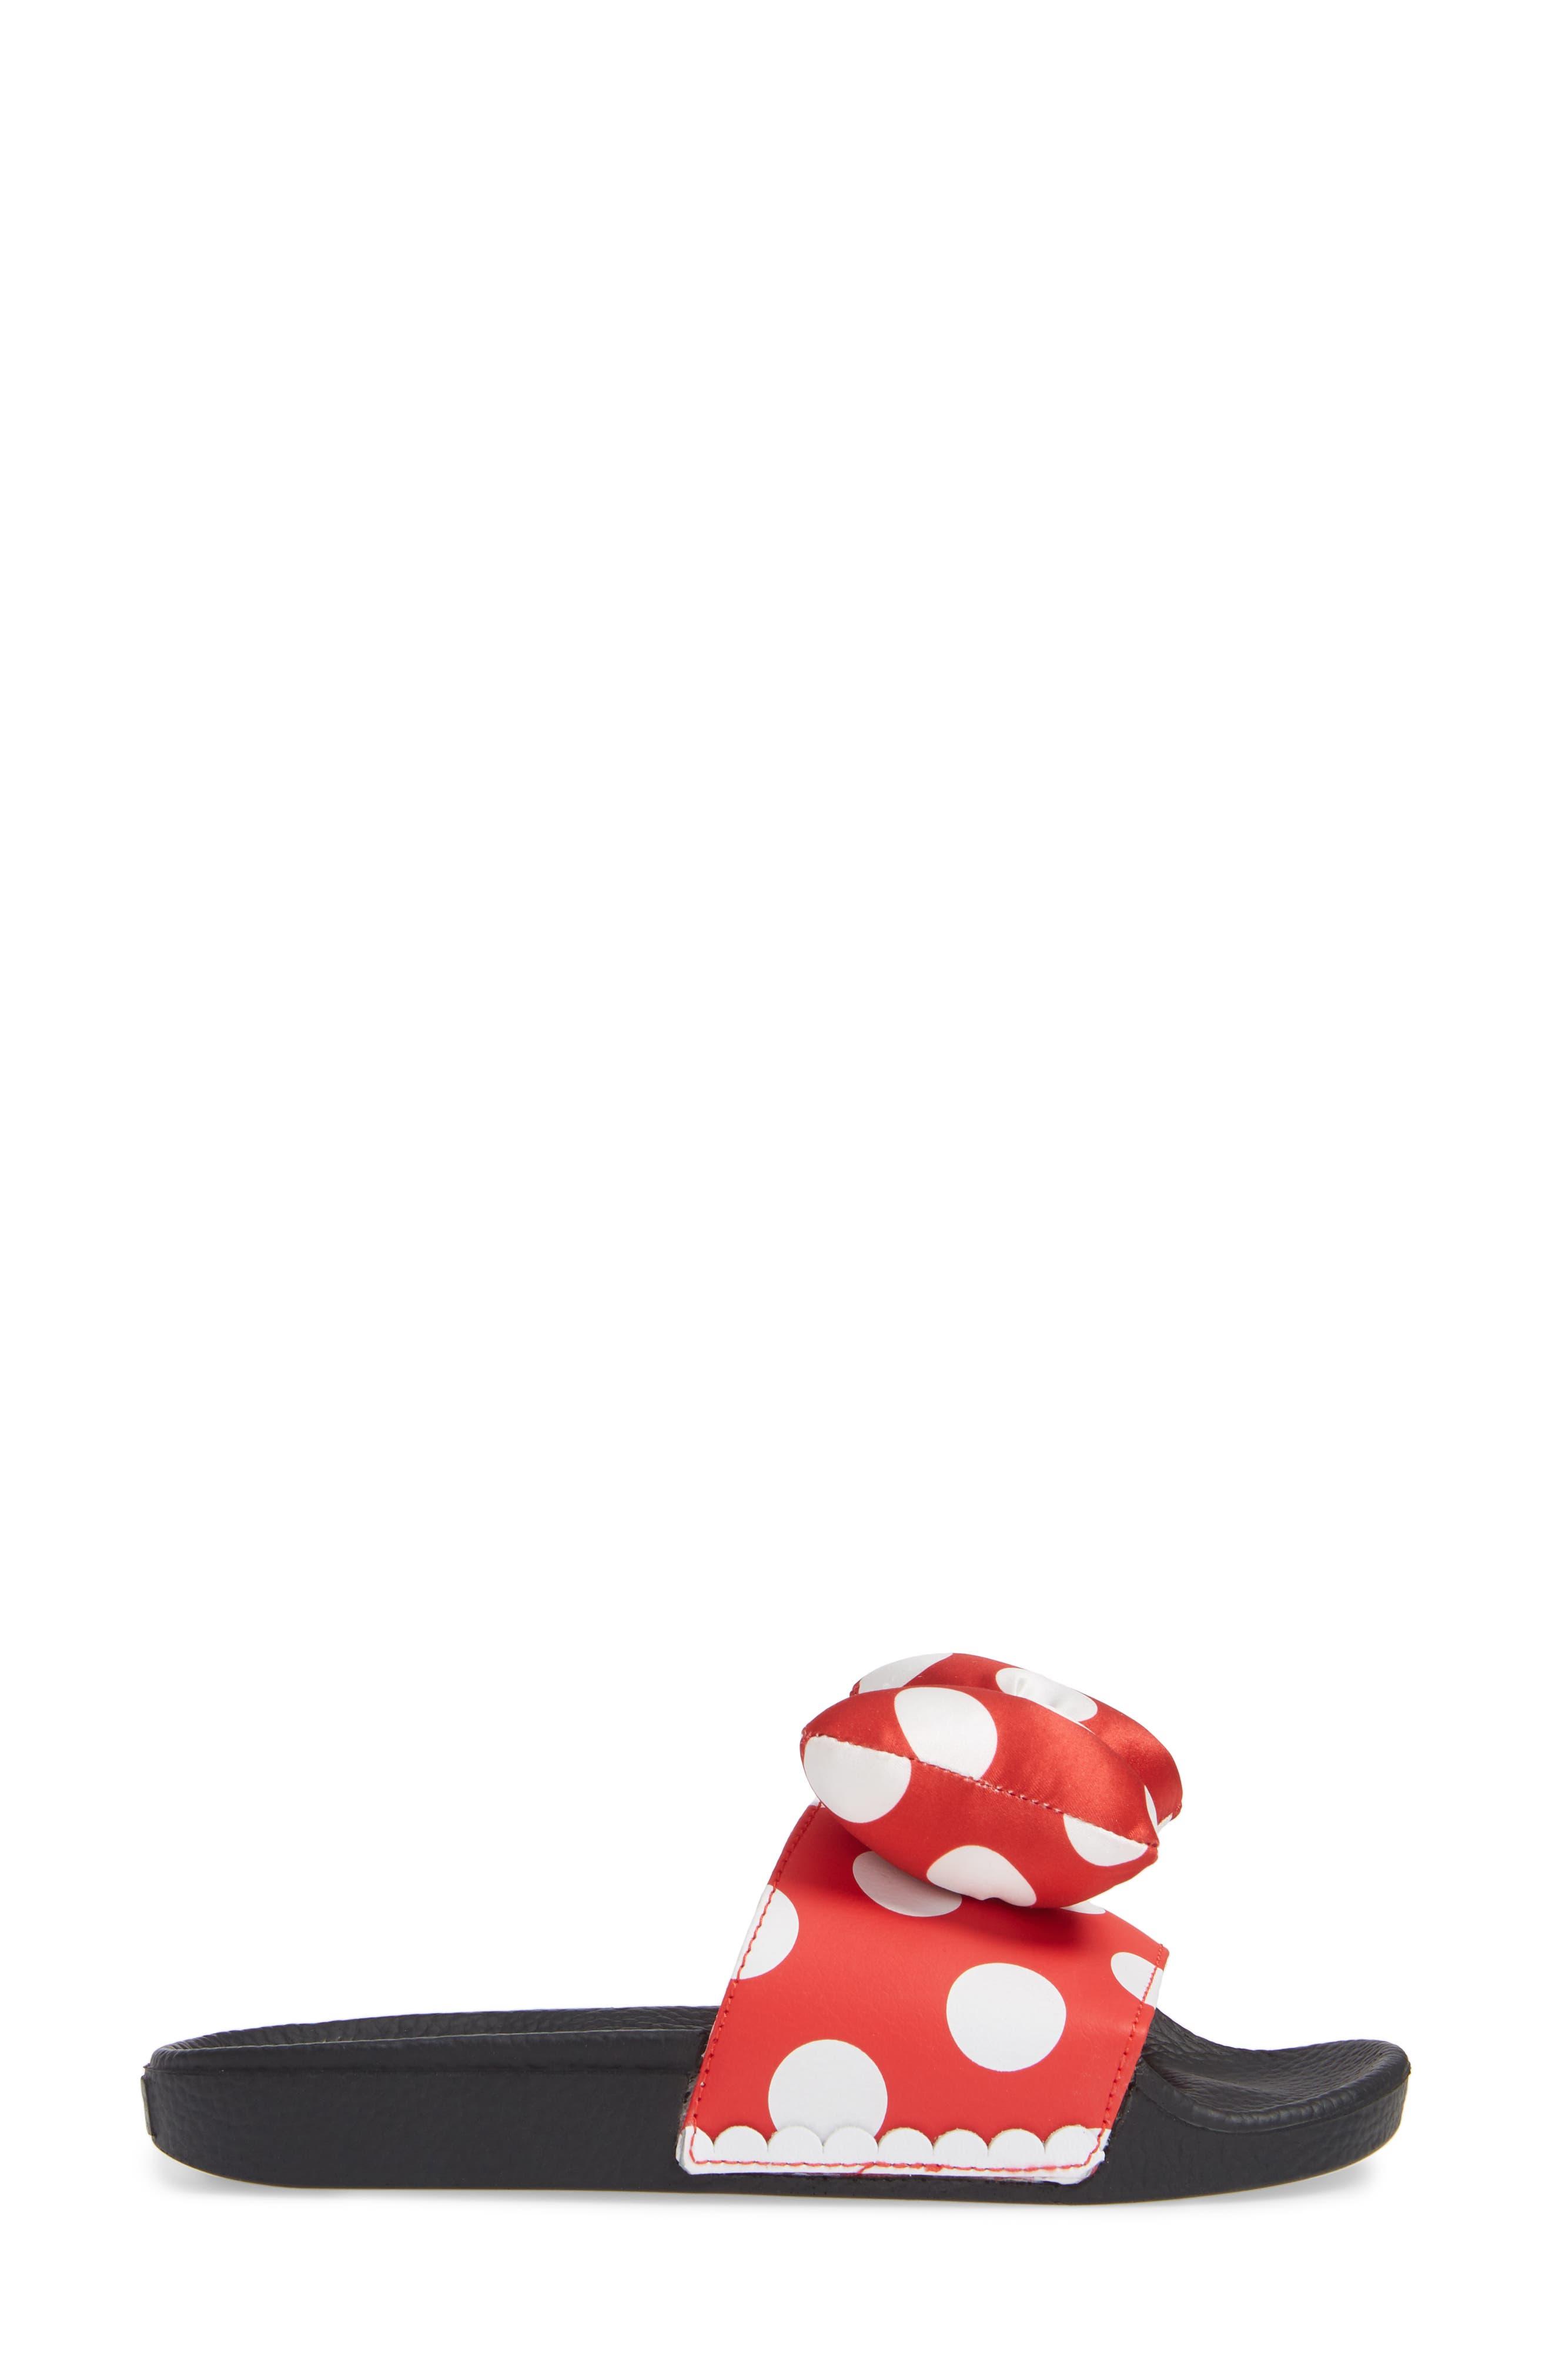 x Disney Minnie Mouse Slide Sandal,                             Alternate thumbnail 3, color,                             600